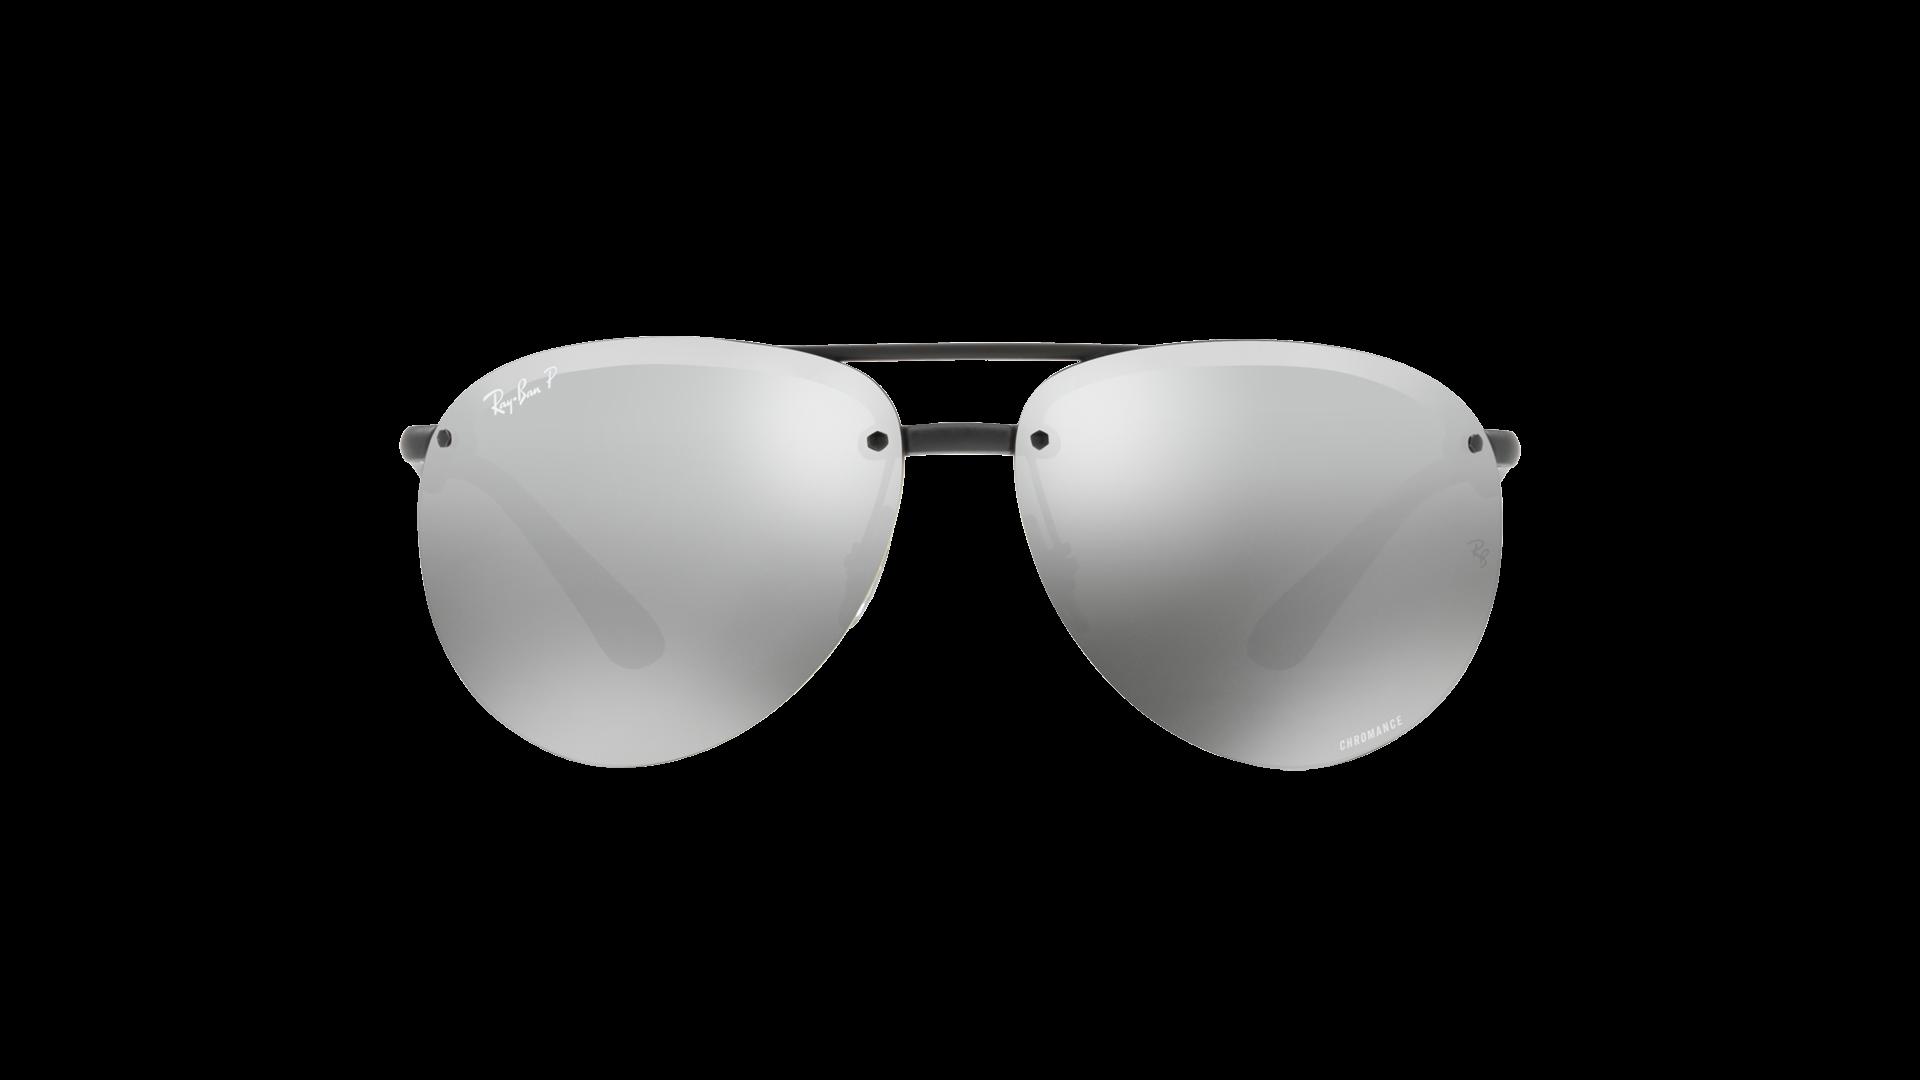 22544ff2b Sunglasses Ray-Ban RB4293CH 601S/5J 65-13 Black Matte Chromance Large  Polarized Mirror